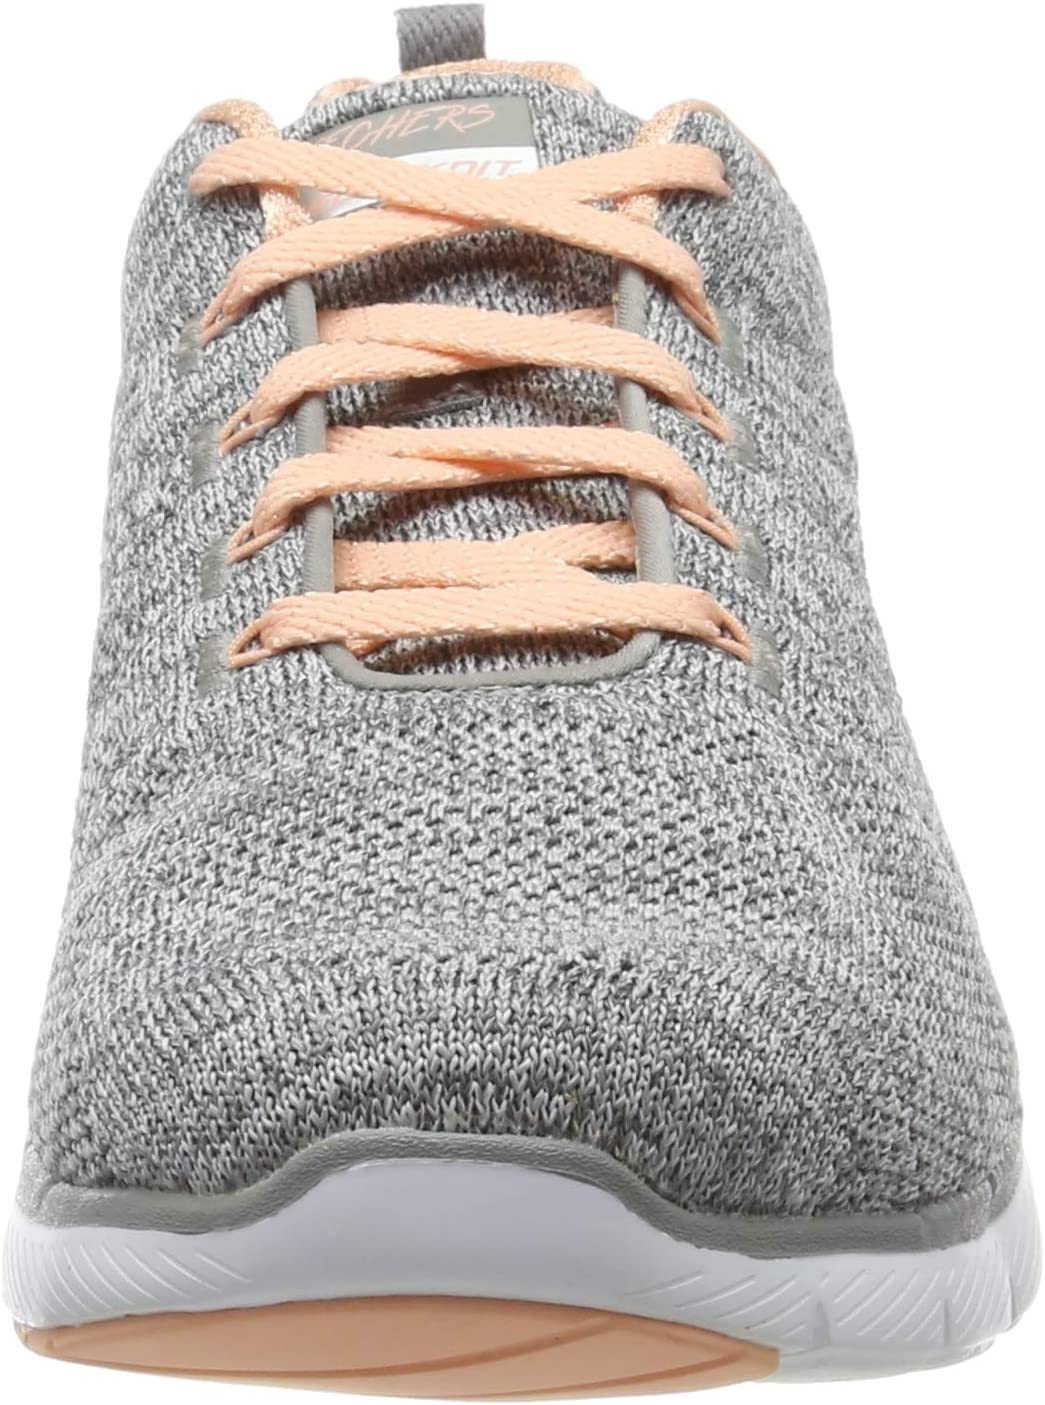 Skechers vrouwen Flex Appeal 3.0-hoge getijden Trainers Grey (Gray Knit Mesh/Coral Trim Gycl)